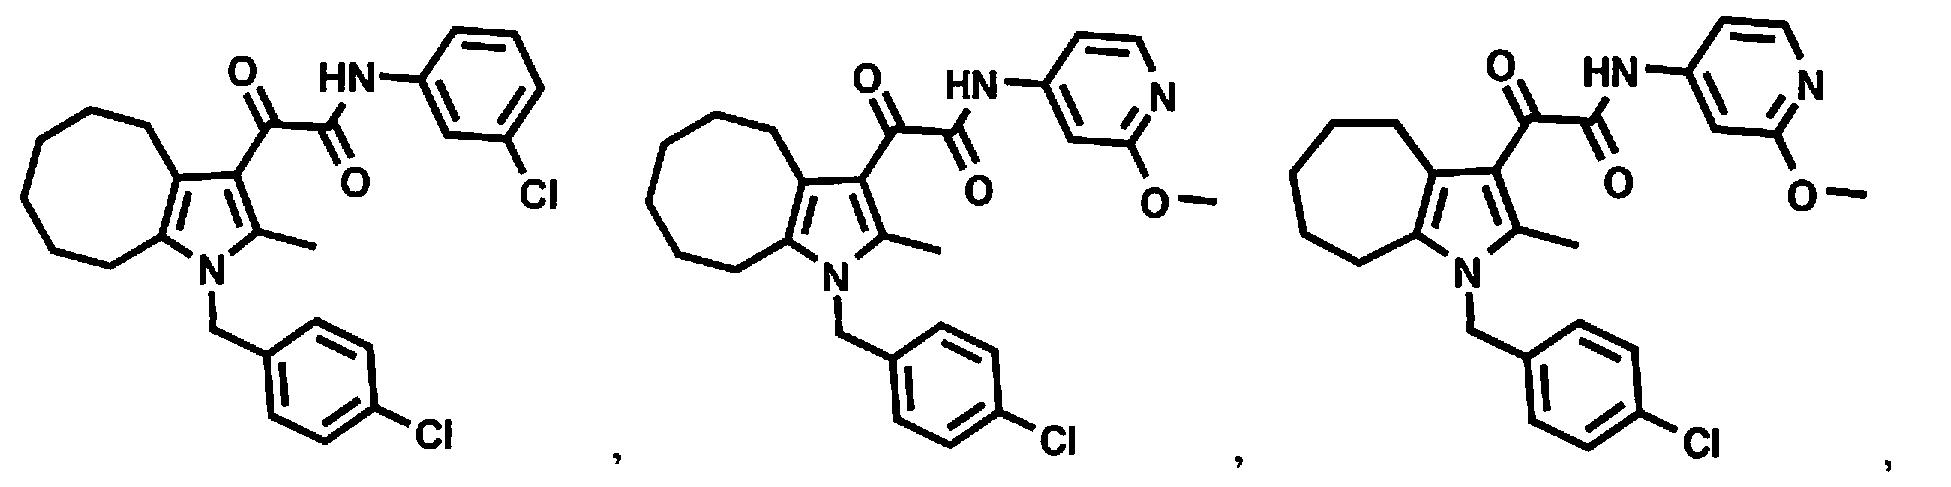 WO2011071996A1 - Faah inhibitors - Google Patents